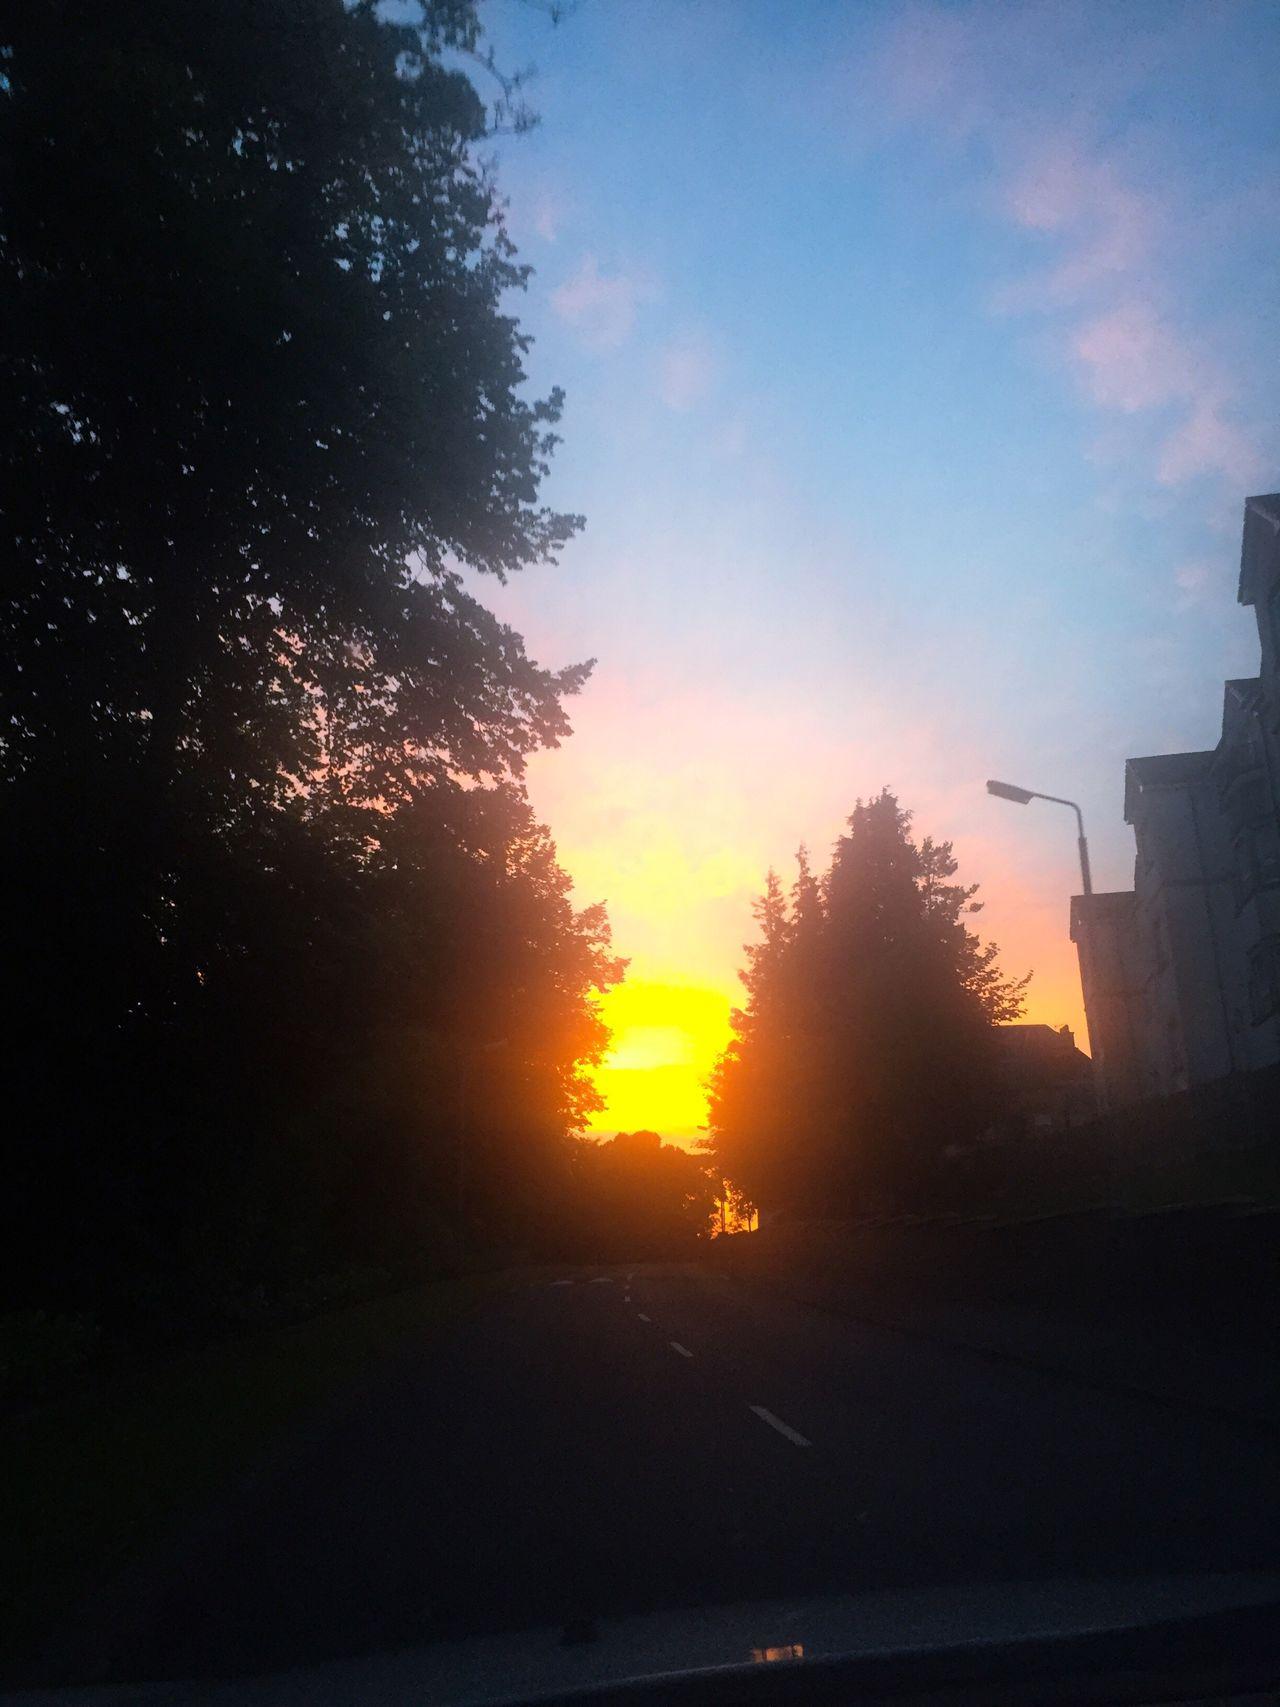 Coming home last night! Sunset Sky Trees Shadow Summer #summertime #sun #TagsForLikes.com #hot #sunny #warm #fun #beautiful #sky #clearskys #season #seasons #instagood #instasummer #photooftheday #nature #TFLers #clearsky #bluesky #vacationtime #weather #summerweather #sunshine #summertimeshine